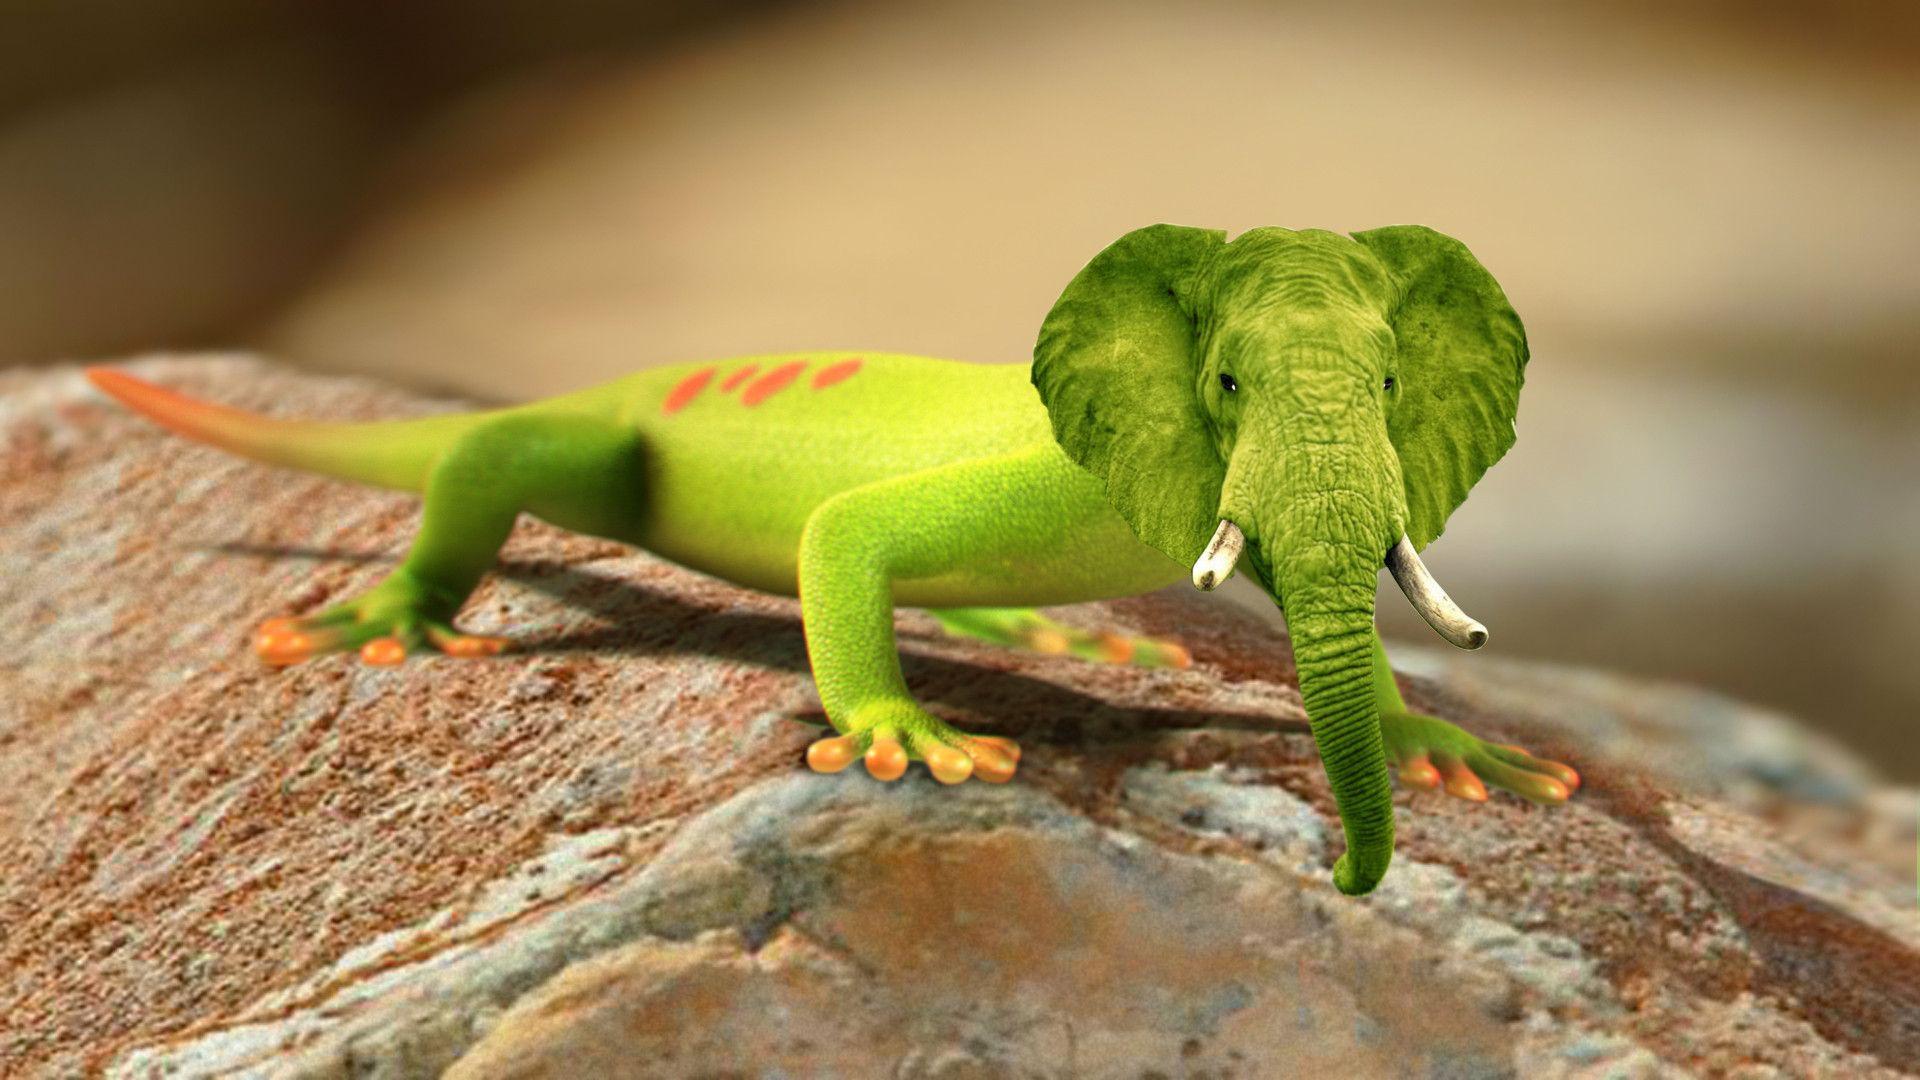 hybrid animals bird - Google Search | Animals, Lizard image